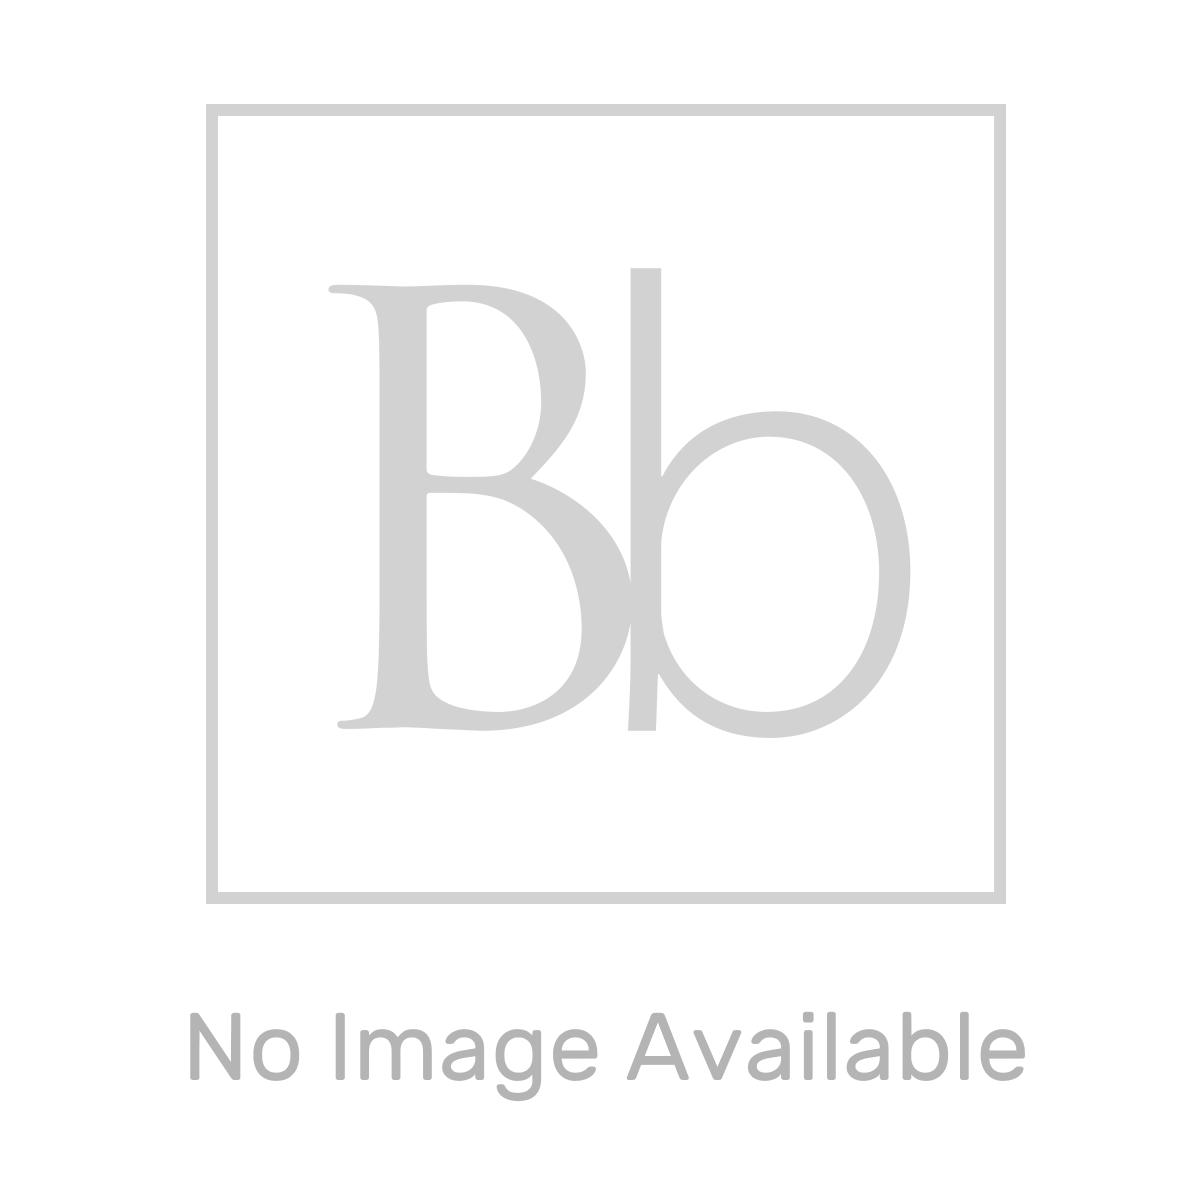 Frontline Atlanta Luxury Single Ended Bath in Situation